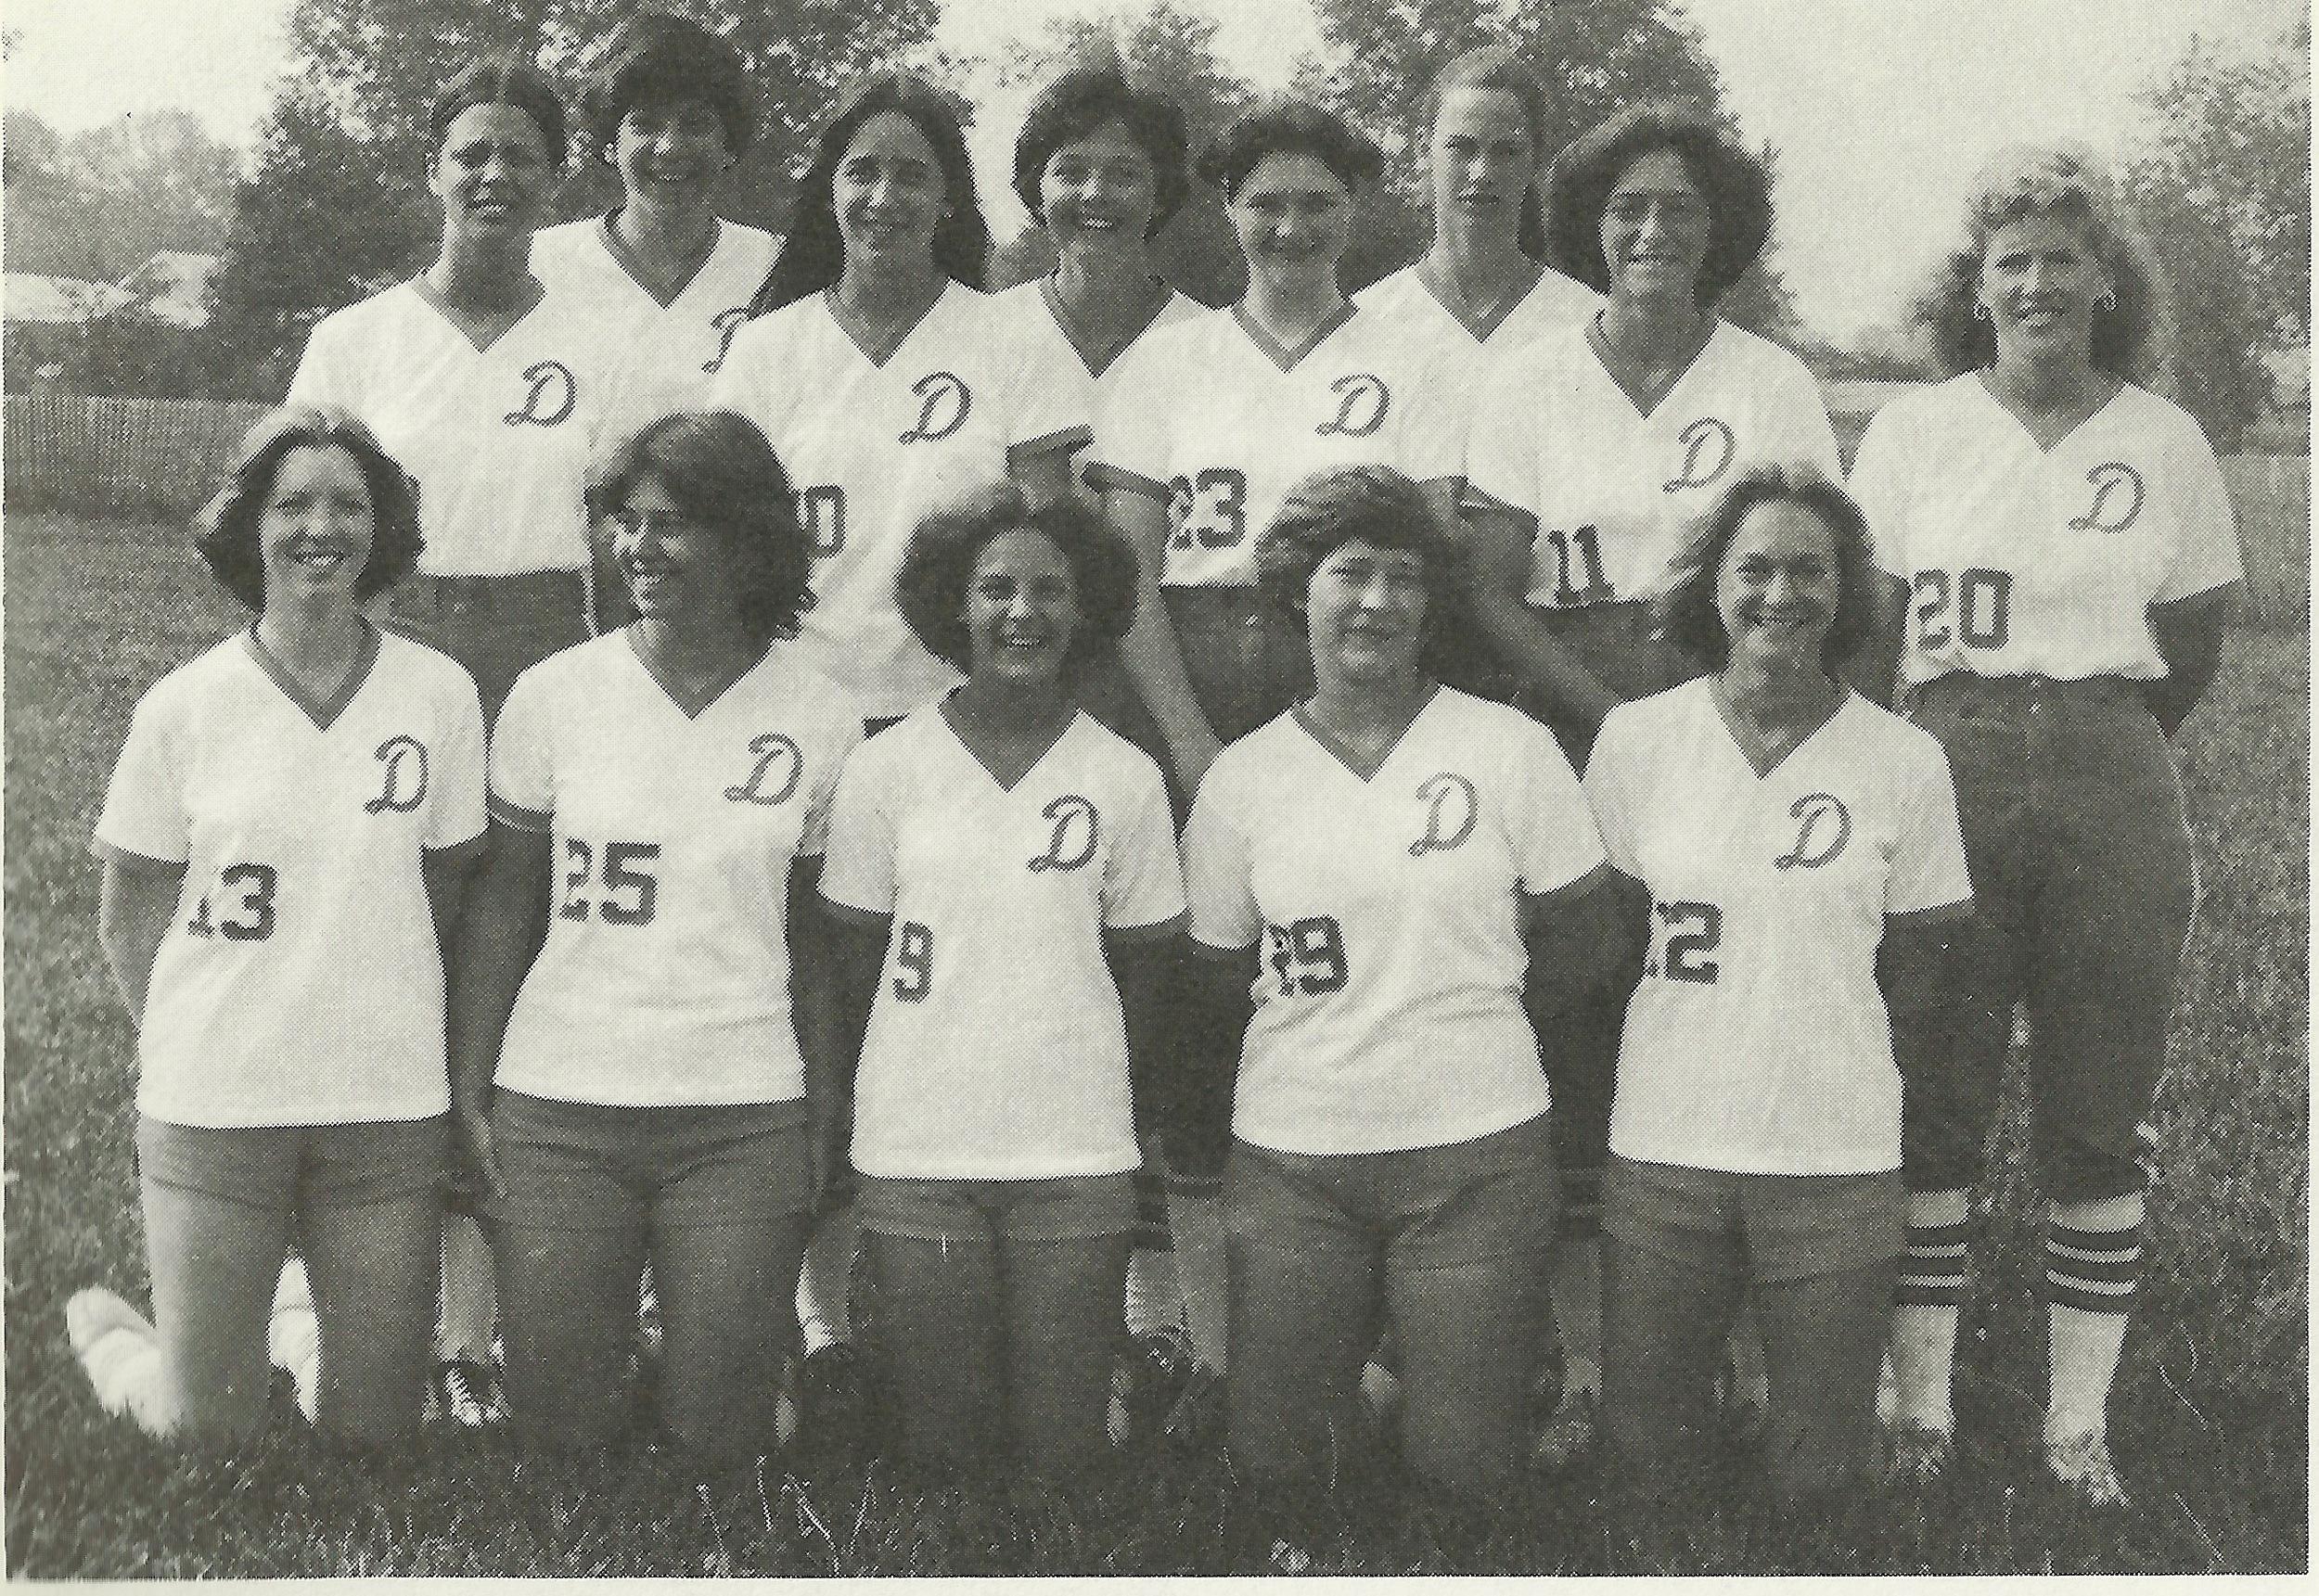 1979 District Champions